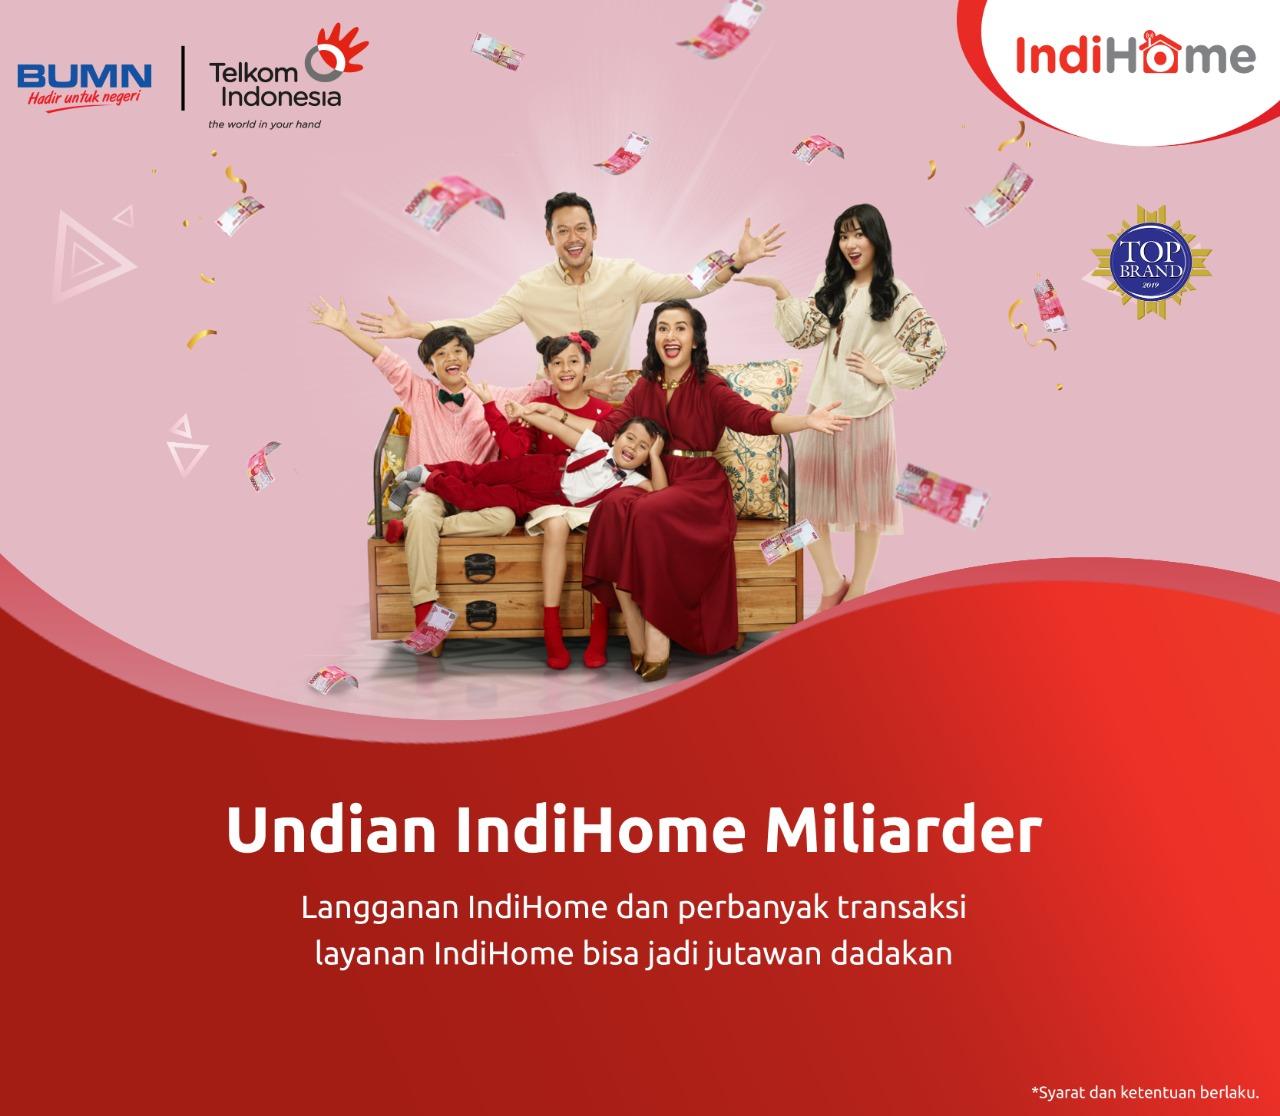 Undian-IndiHome-Miliarder_75525_D.jpg